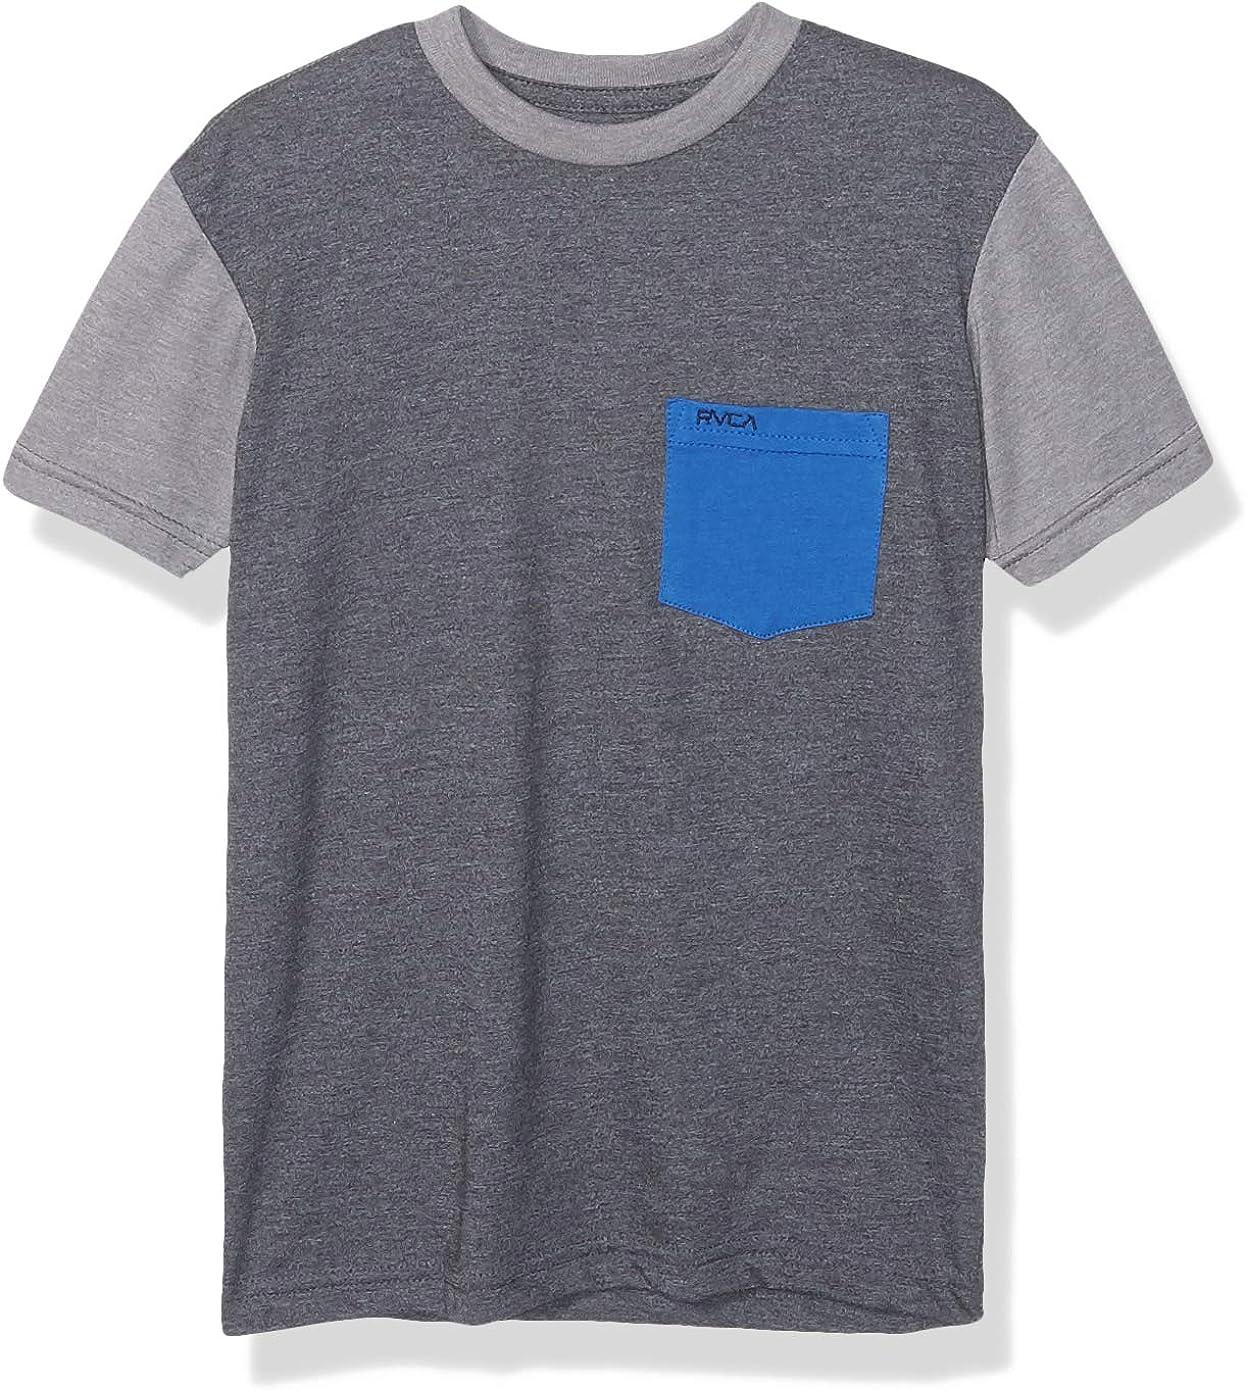 RVCA Boys Ollie Color Block Short Sleeve Crew Neck Pocket T-Shirt Shirt